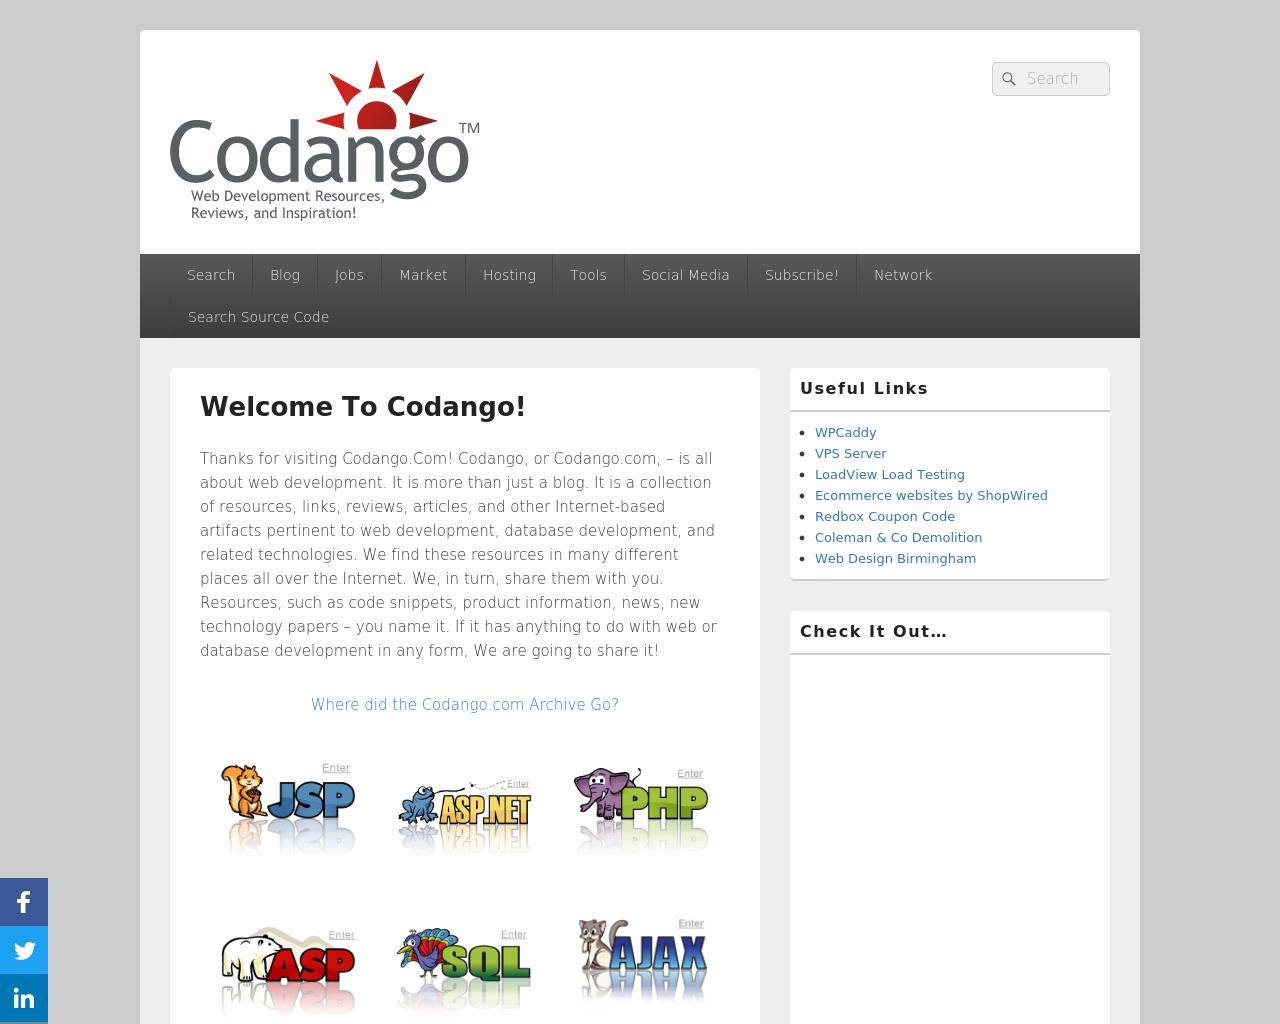 Codango-Advertising-Reviews-Pricing